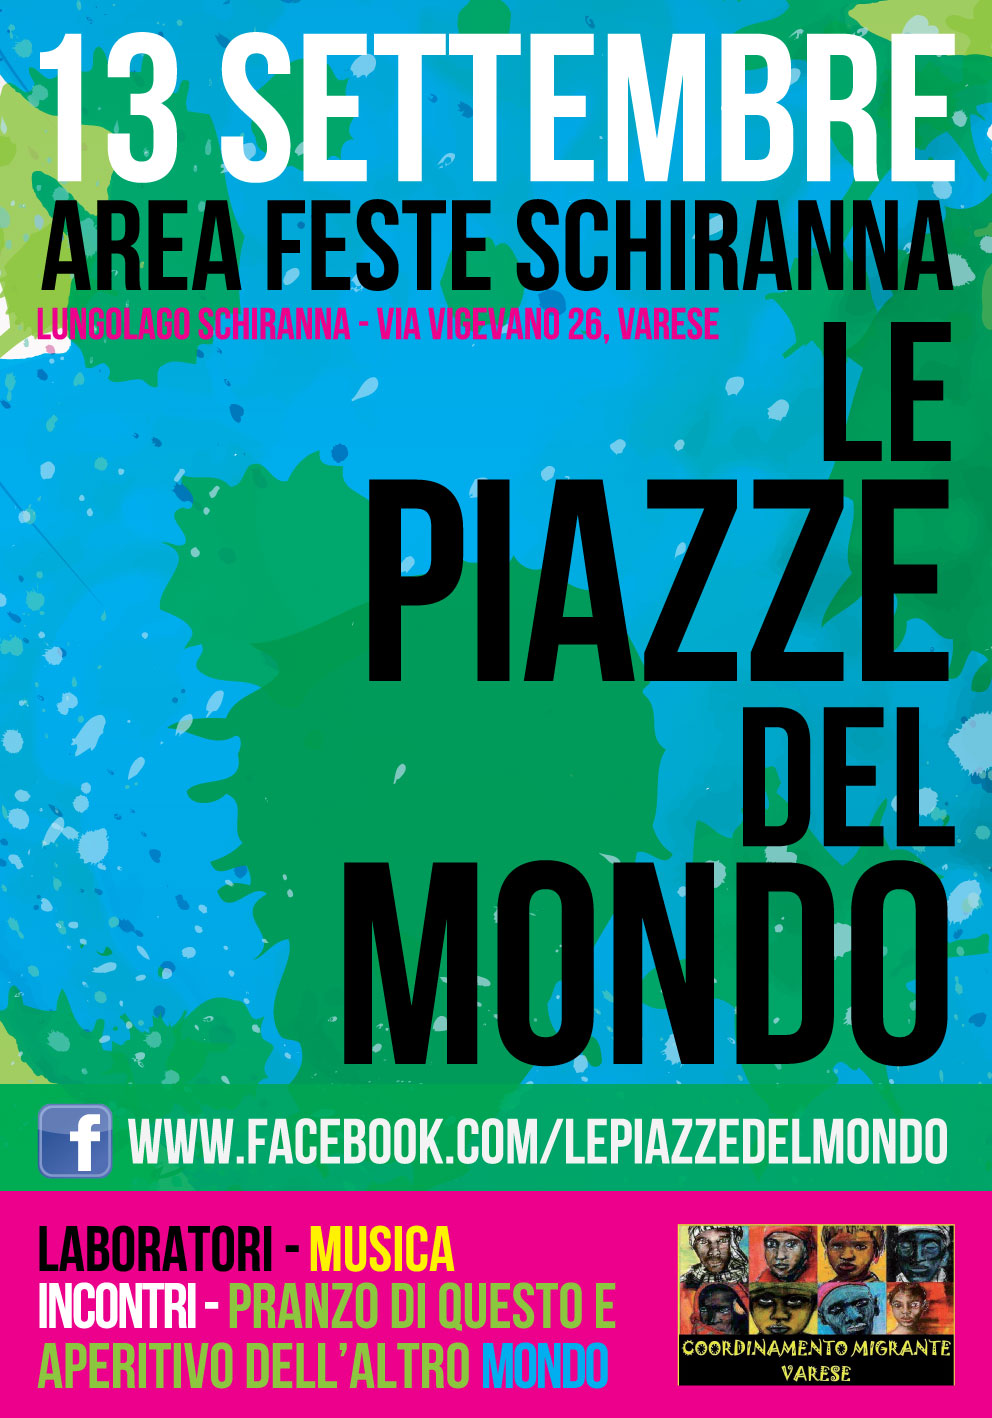 incontri online work Venezia